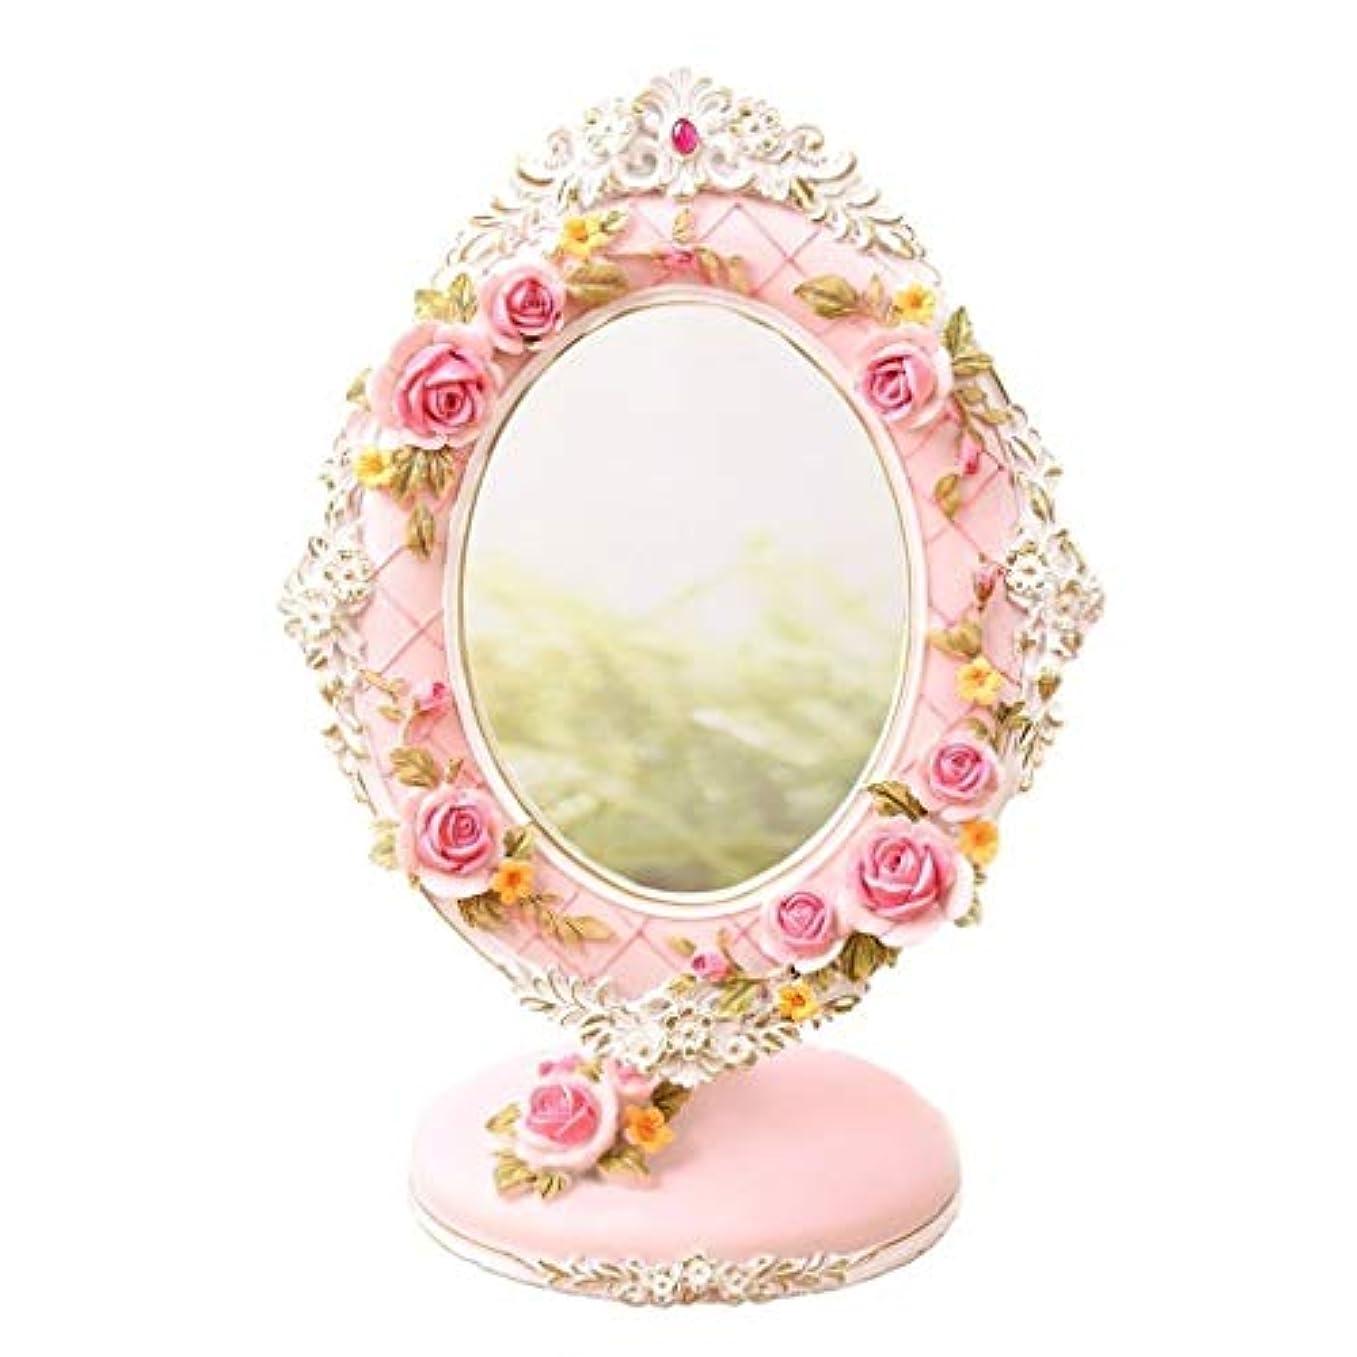 Selm 化粧のためのデスクトップミラー、自然光72度回転自立化粧台ベッドルームに適し、バラの彫刻